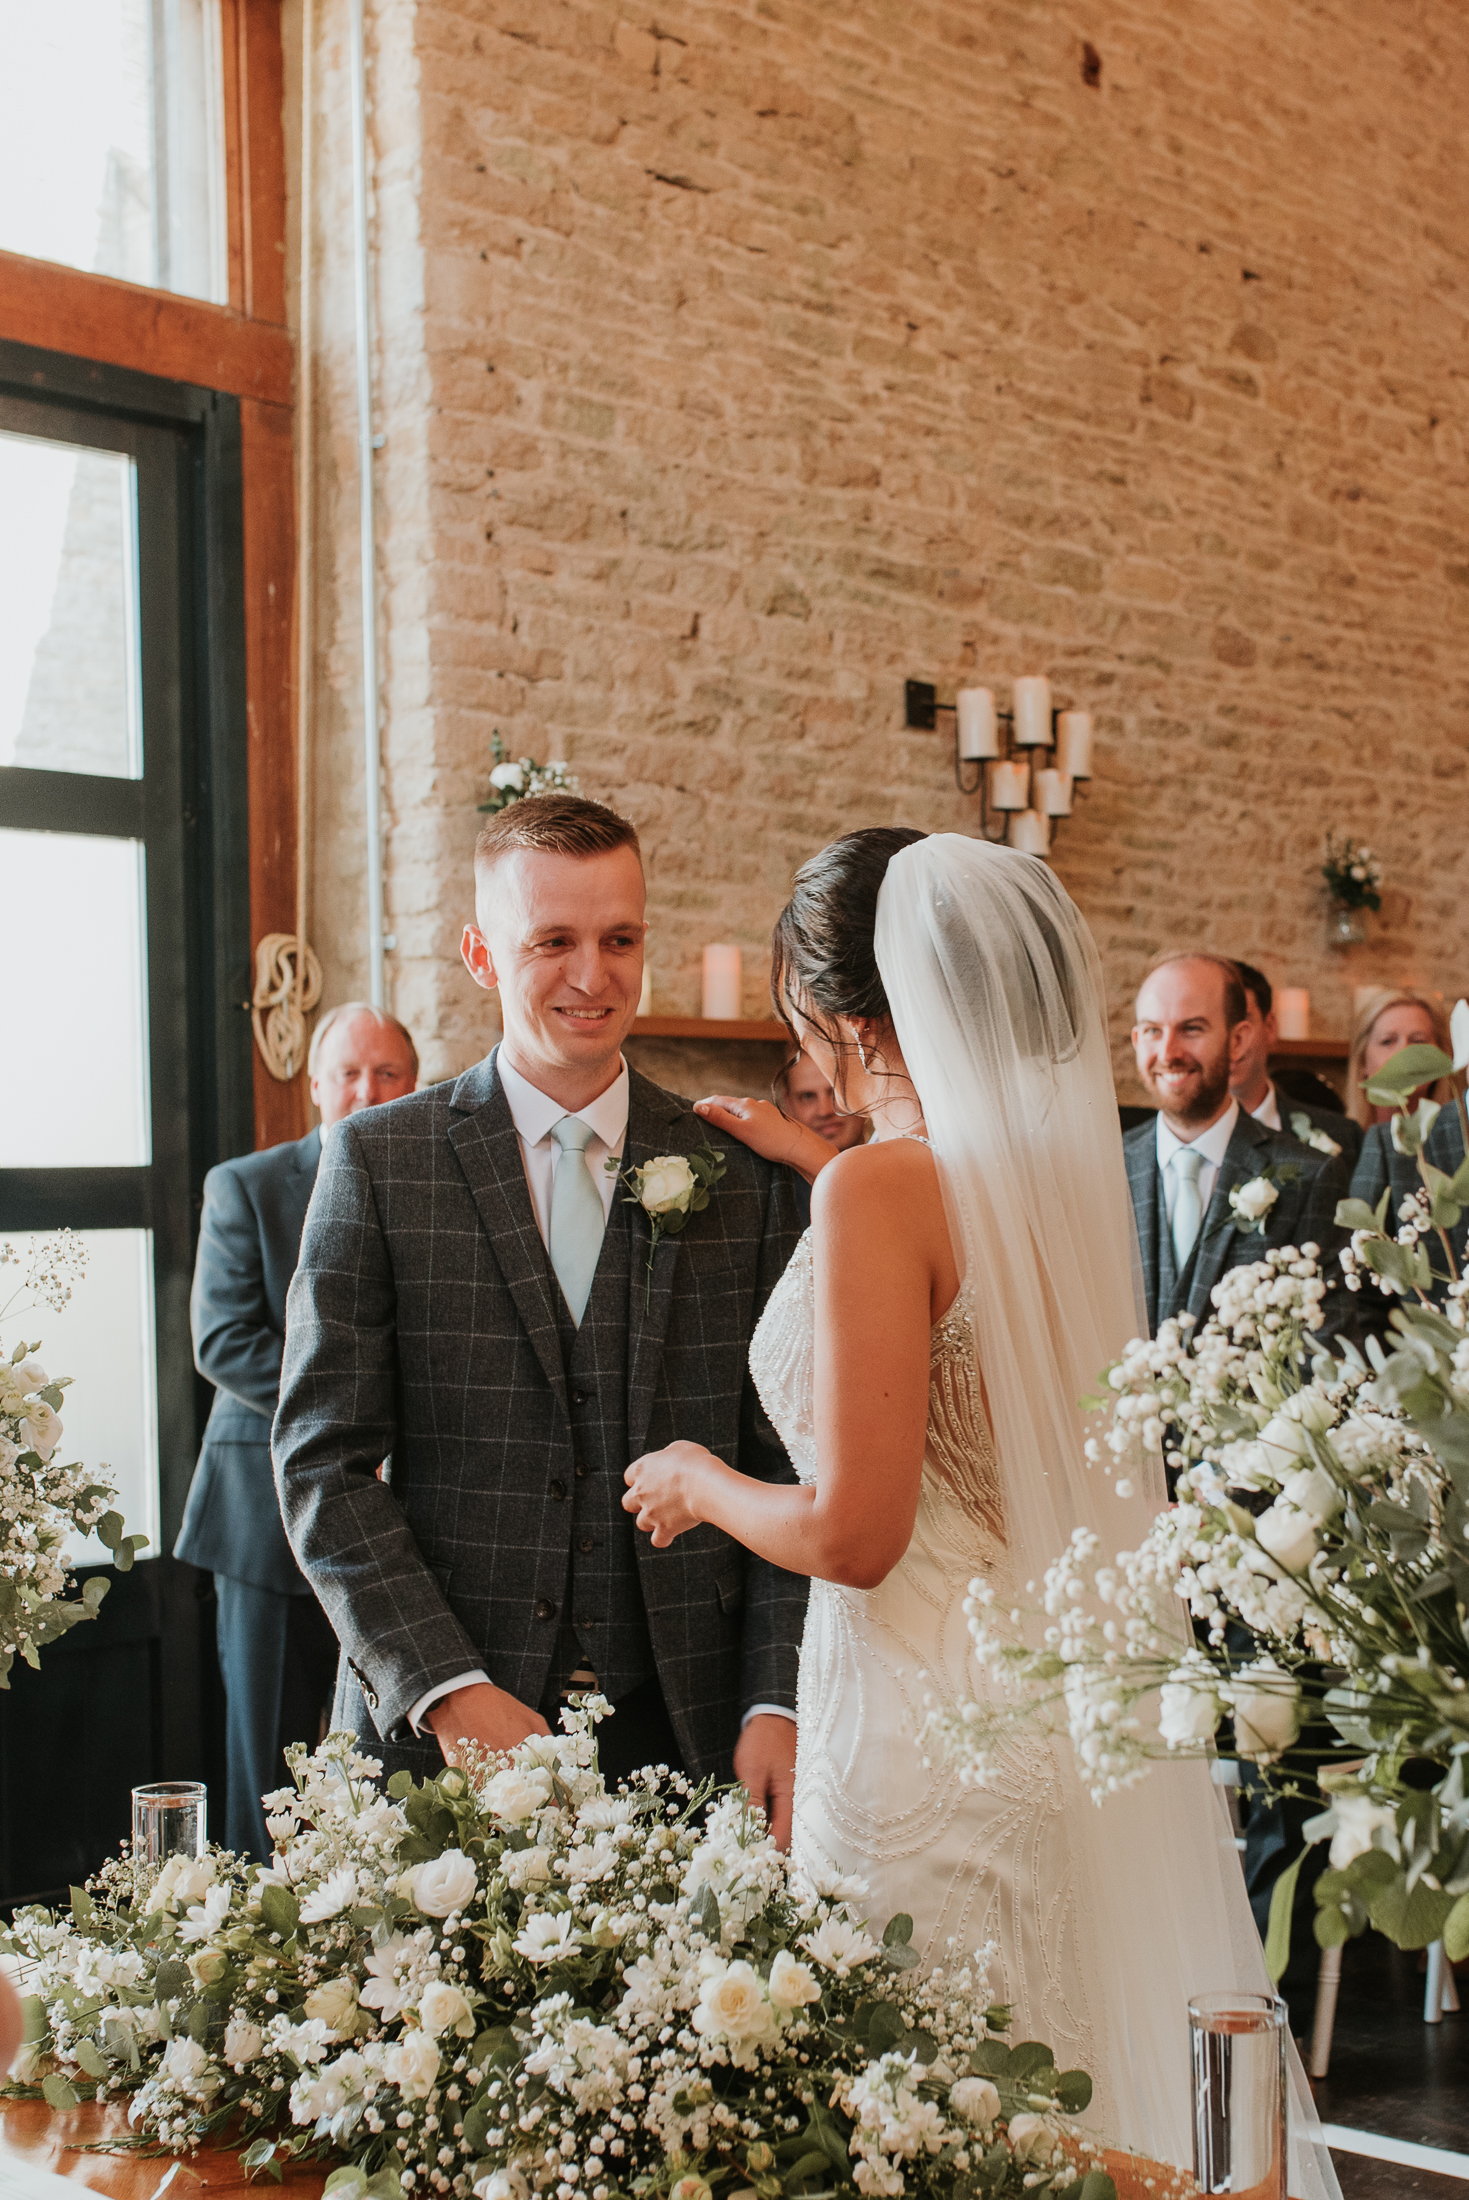 Oxfordshire-wedding-photographer-35.jpg